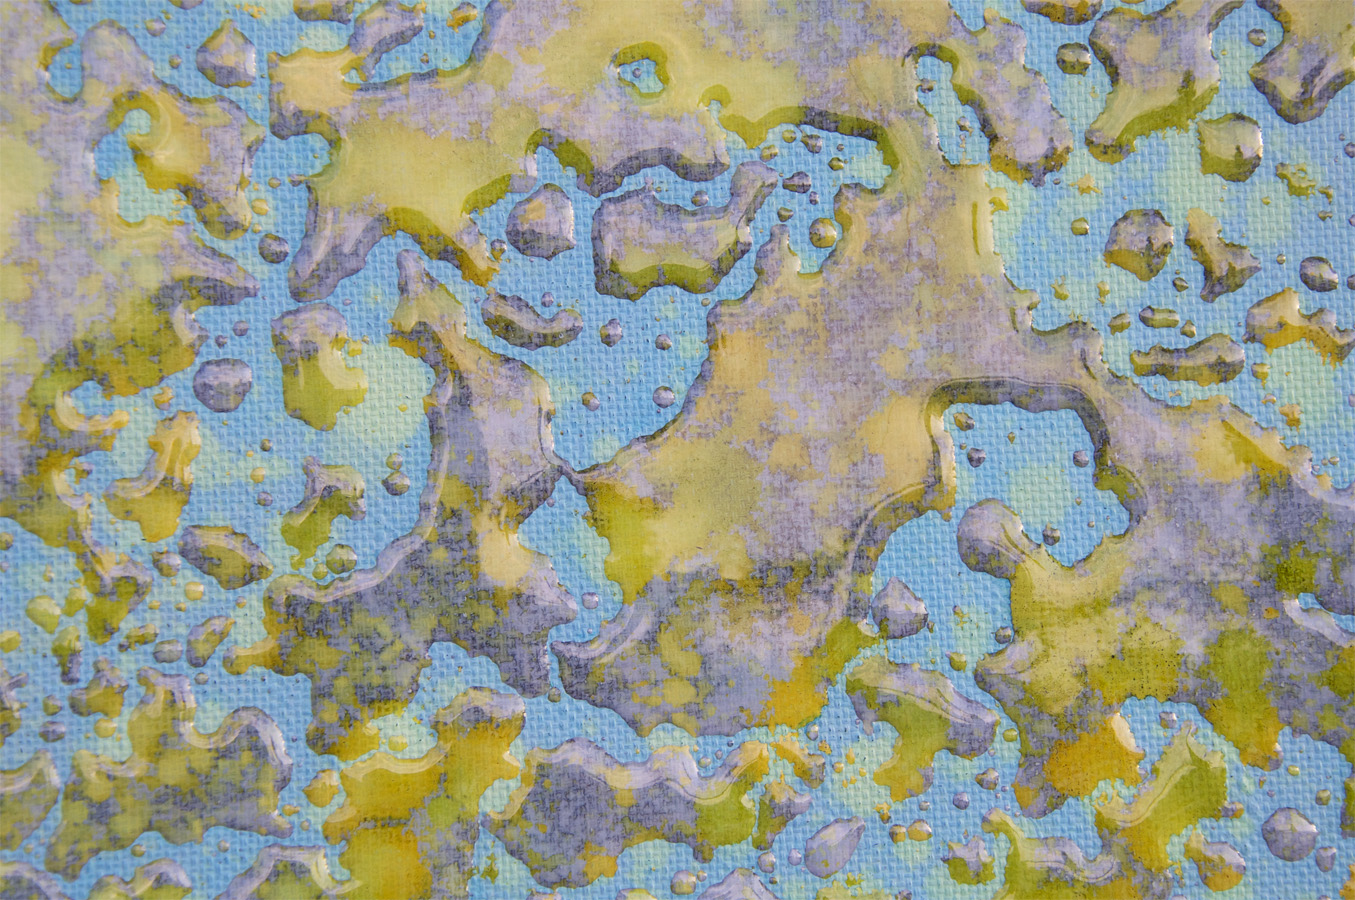 Freydenberg_painting_2015_4.jpg